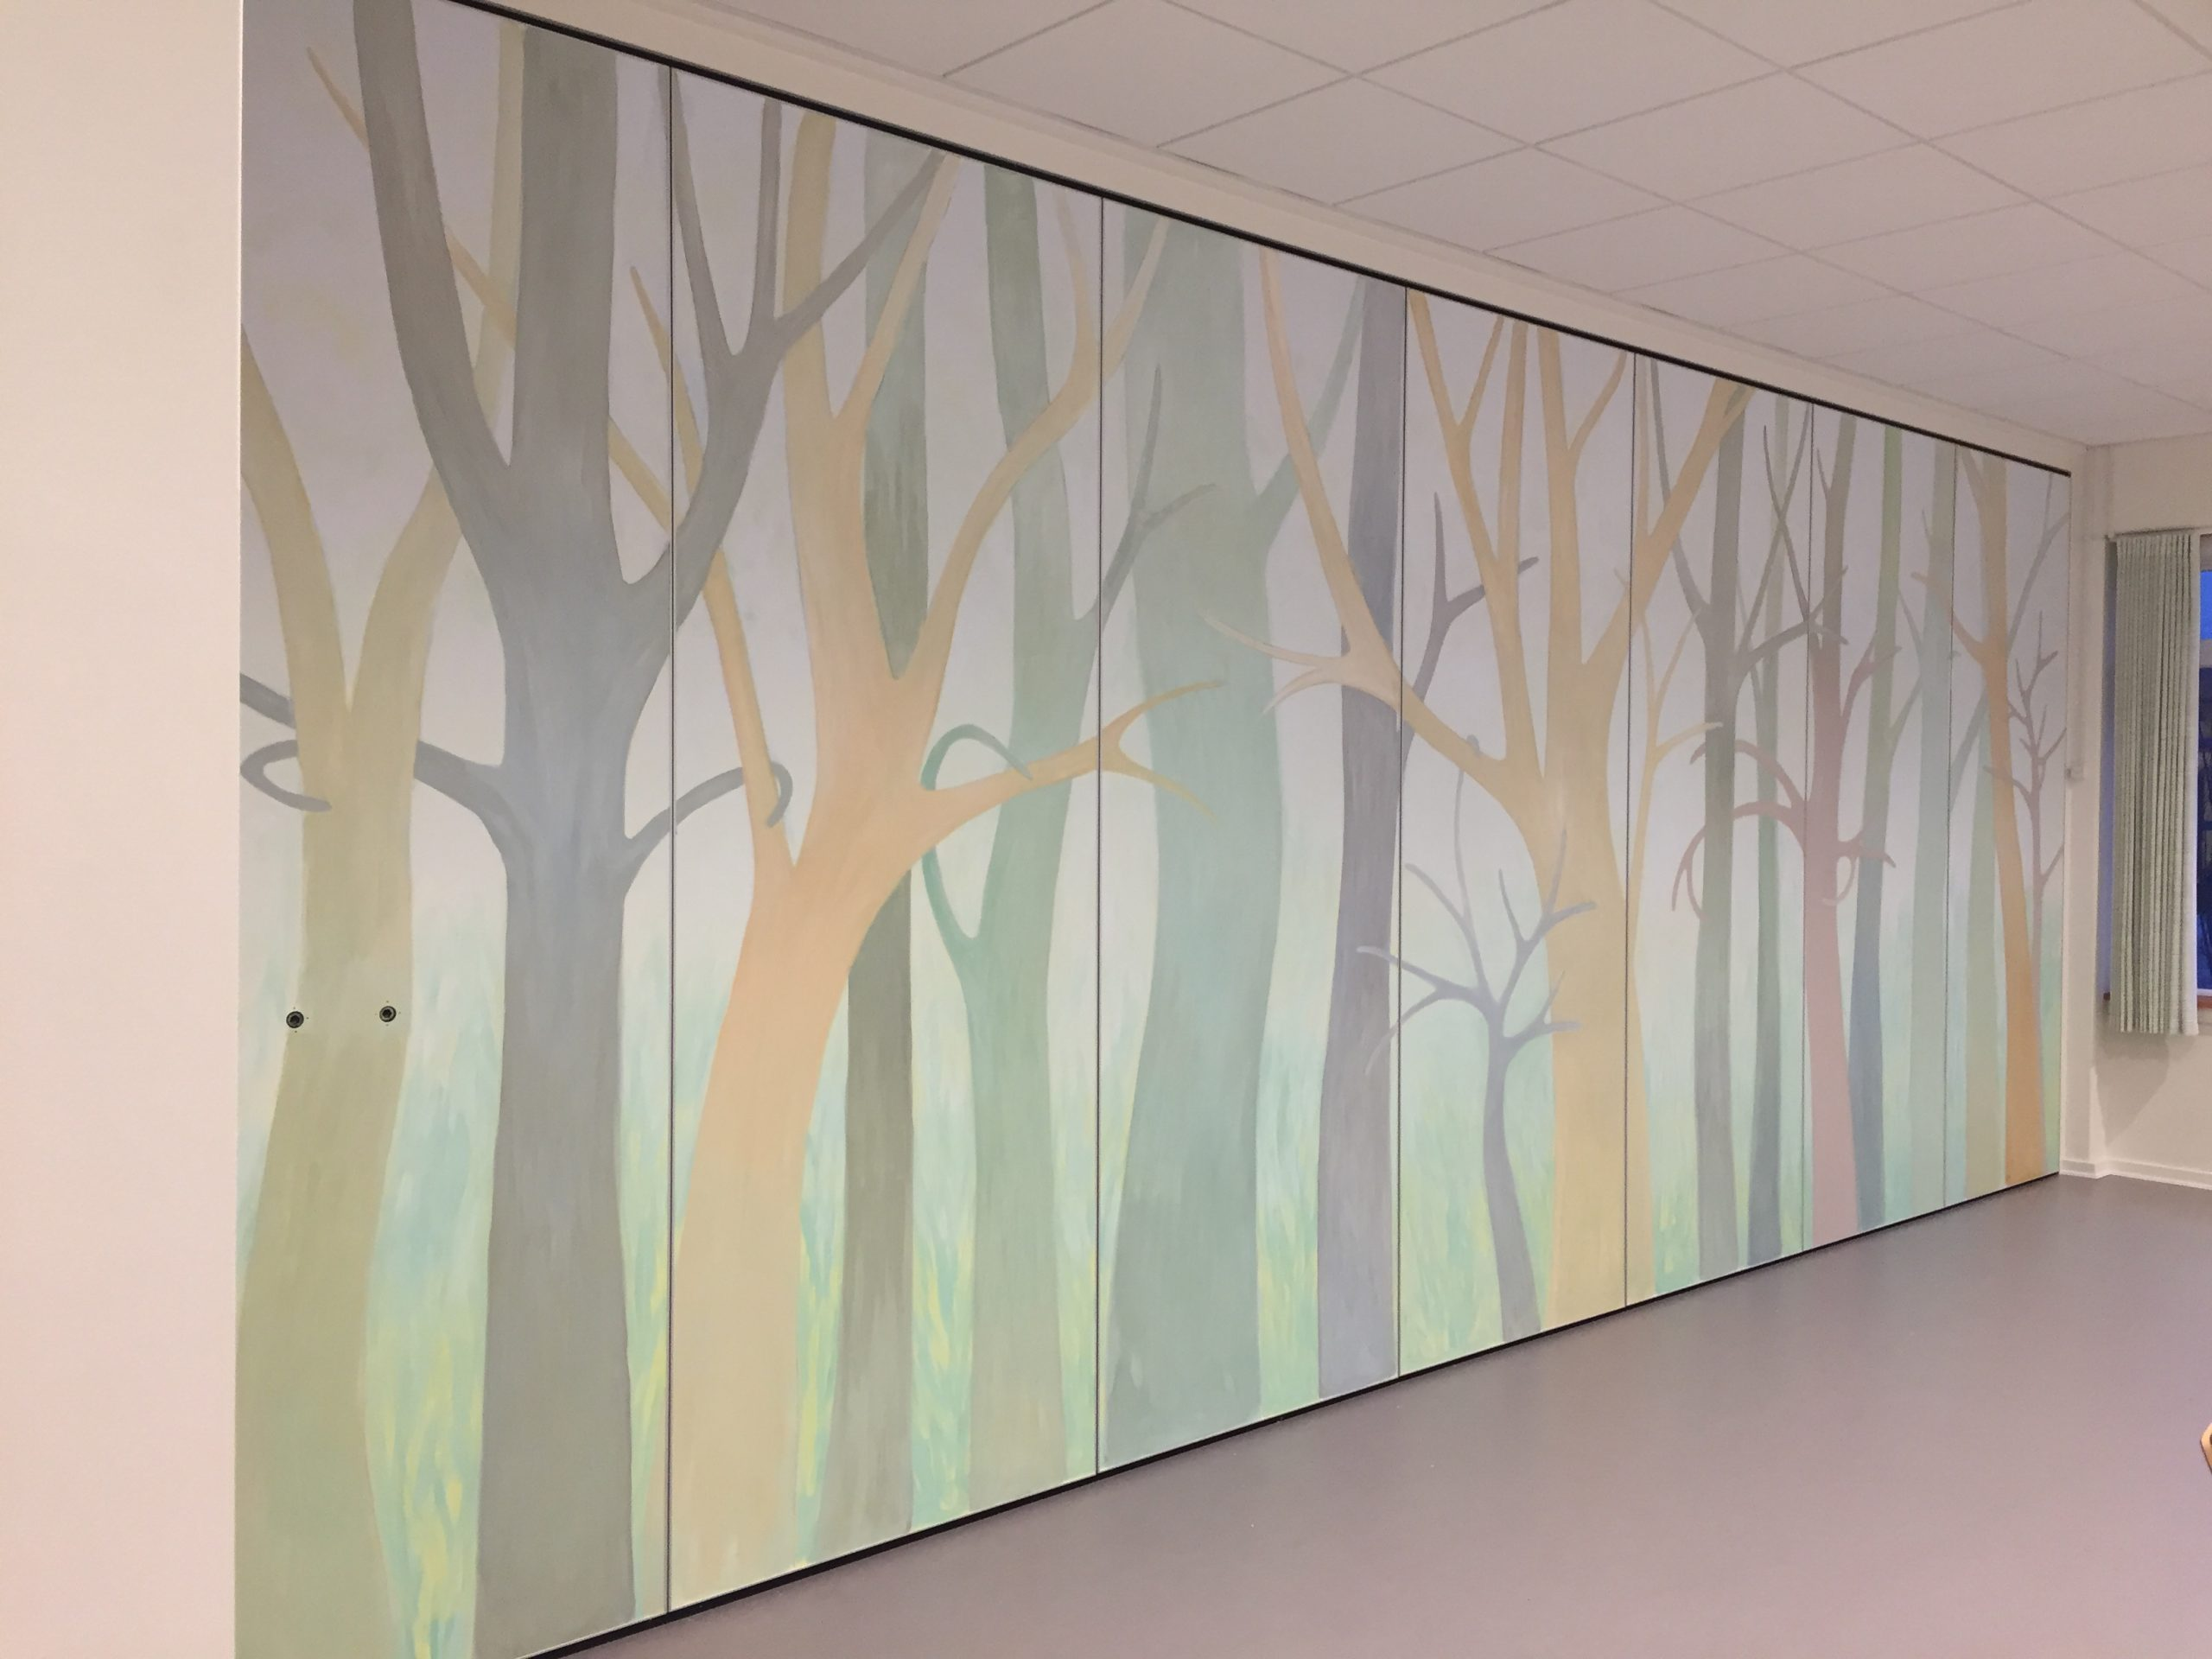 Vægmaleri på Foldevæg Kjellerup Friplejehjem 2